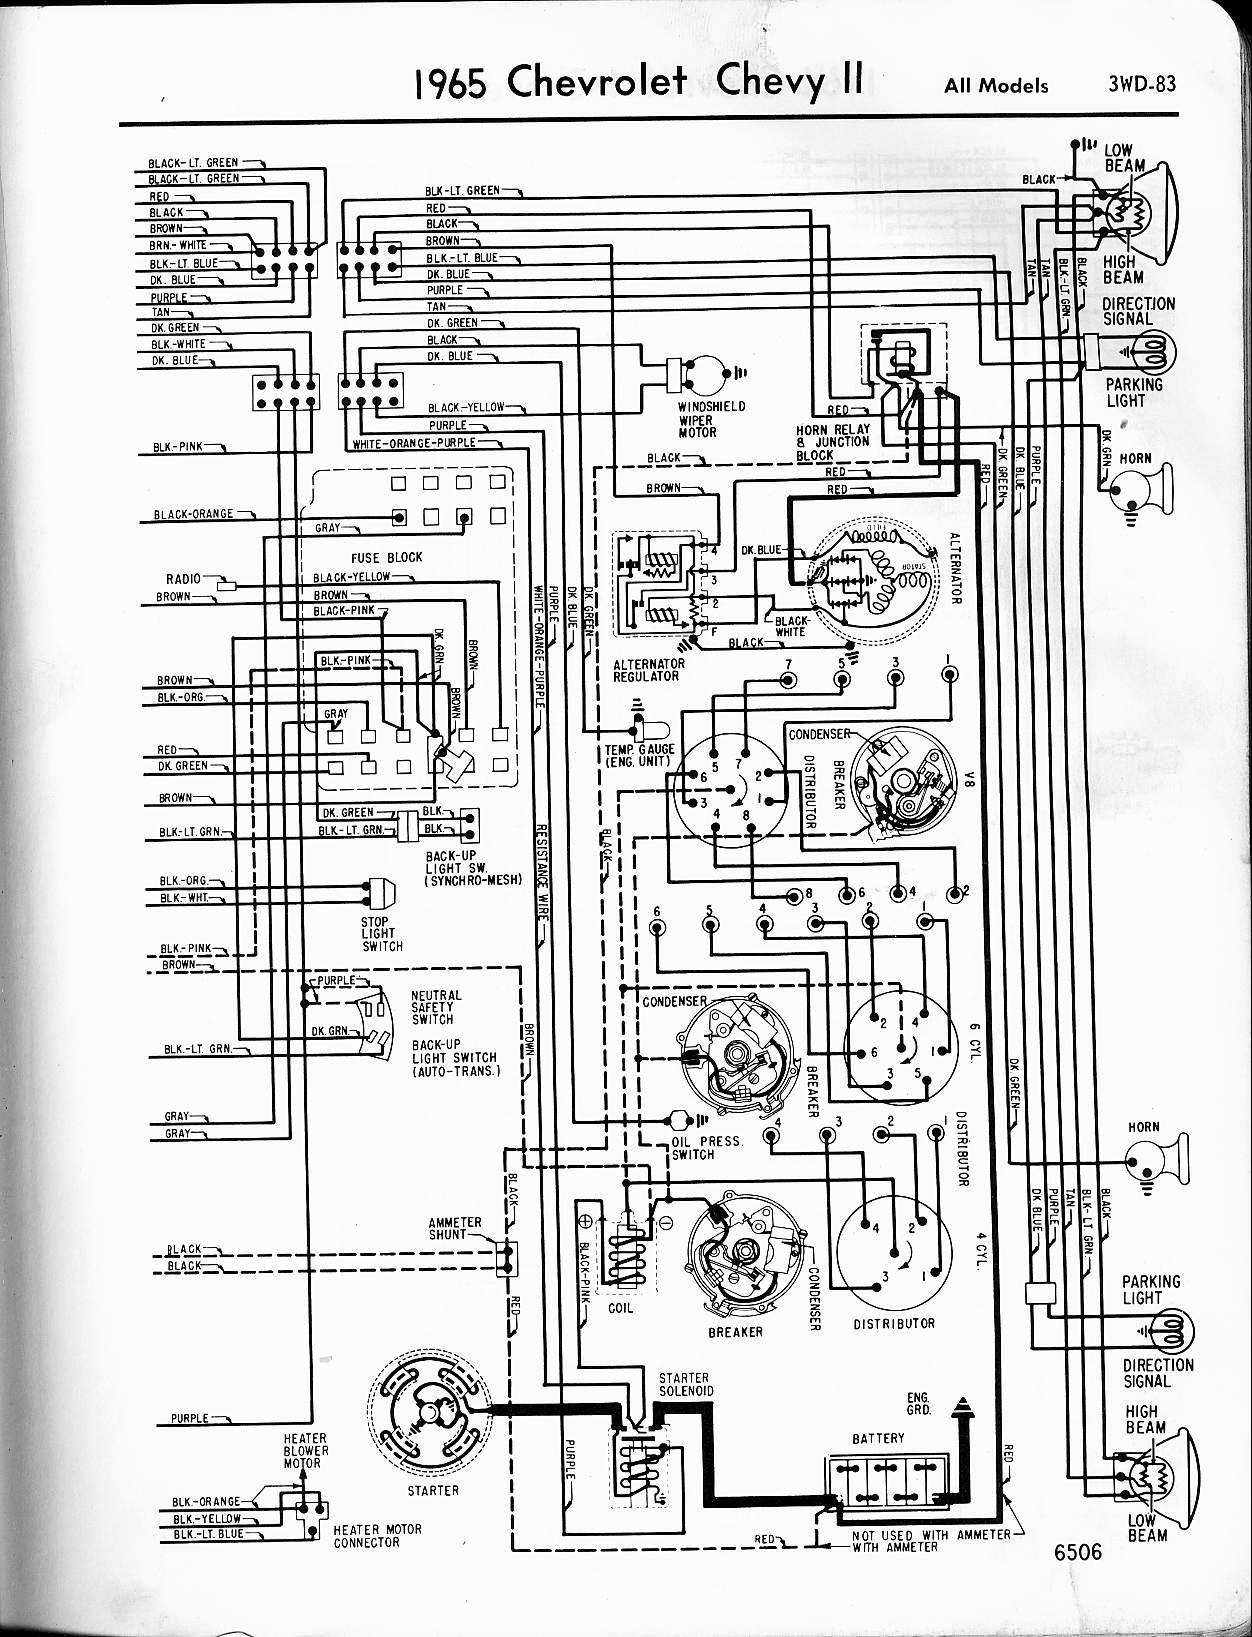 diagram] 64 chevelle headlight switch wiring diagram full version hd  quality wiring diagram - ldiagram.gastroneo.it  diagram database